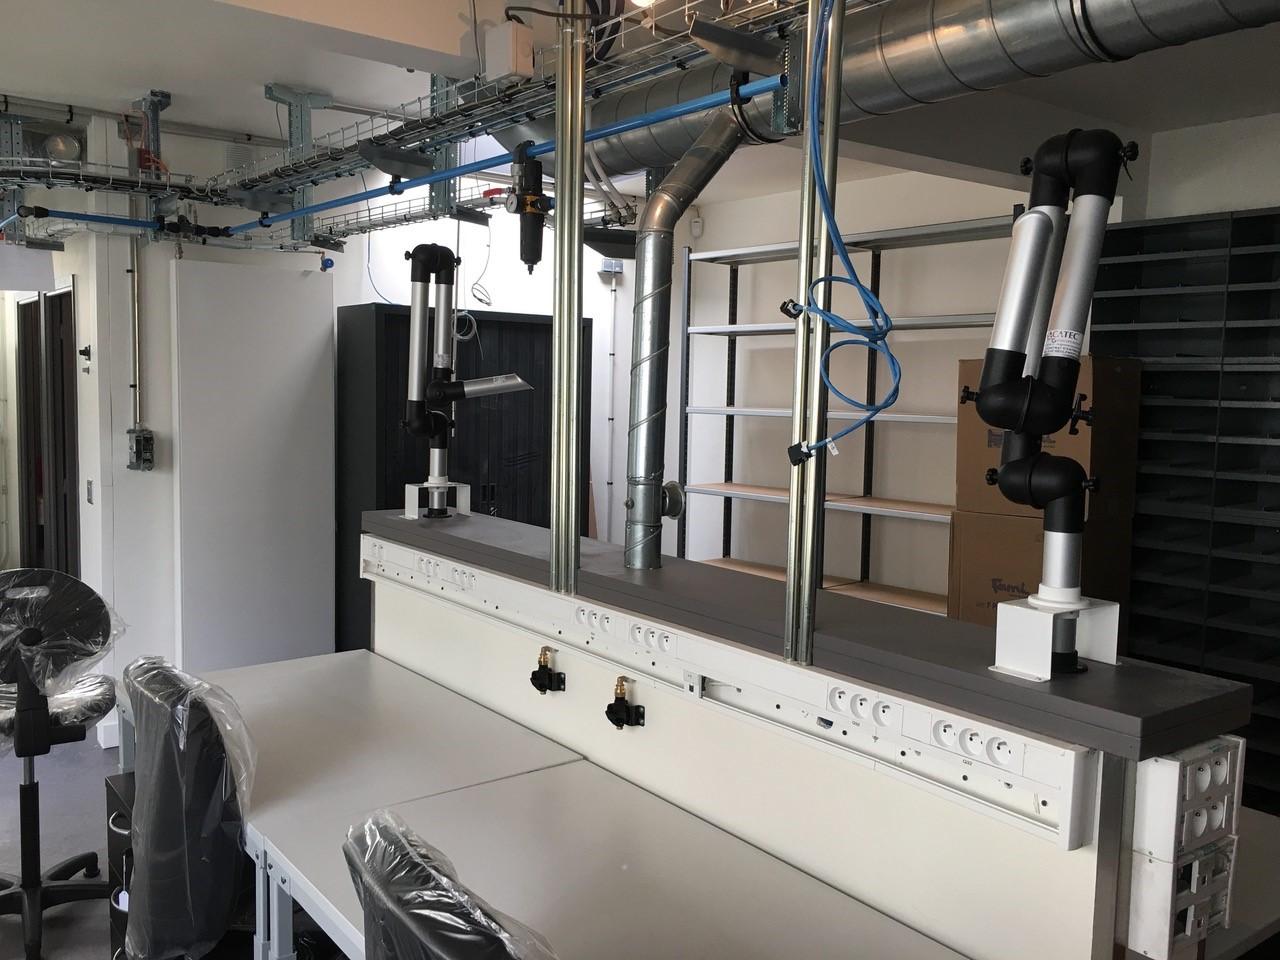 r seau d 39 air comprim atelier7 tuyauterie industrielle en aluminium et inox. Black Bedroom Furniture Sets. Home Design Ideas